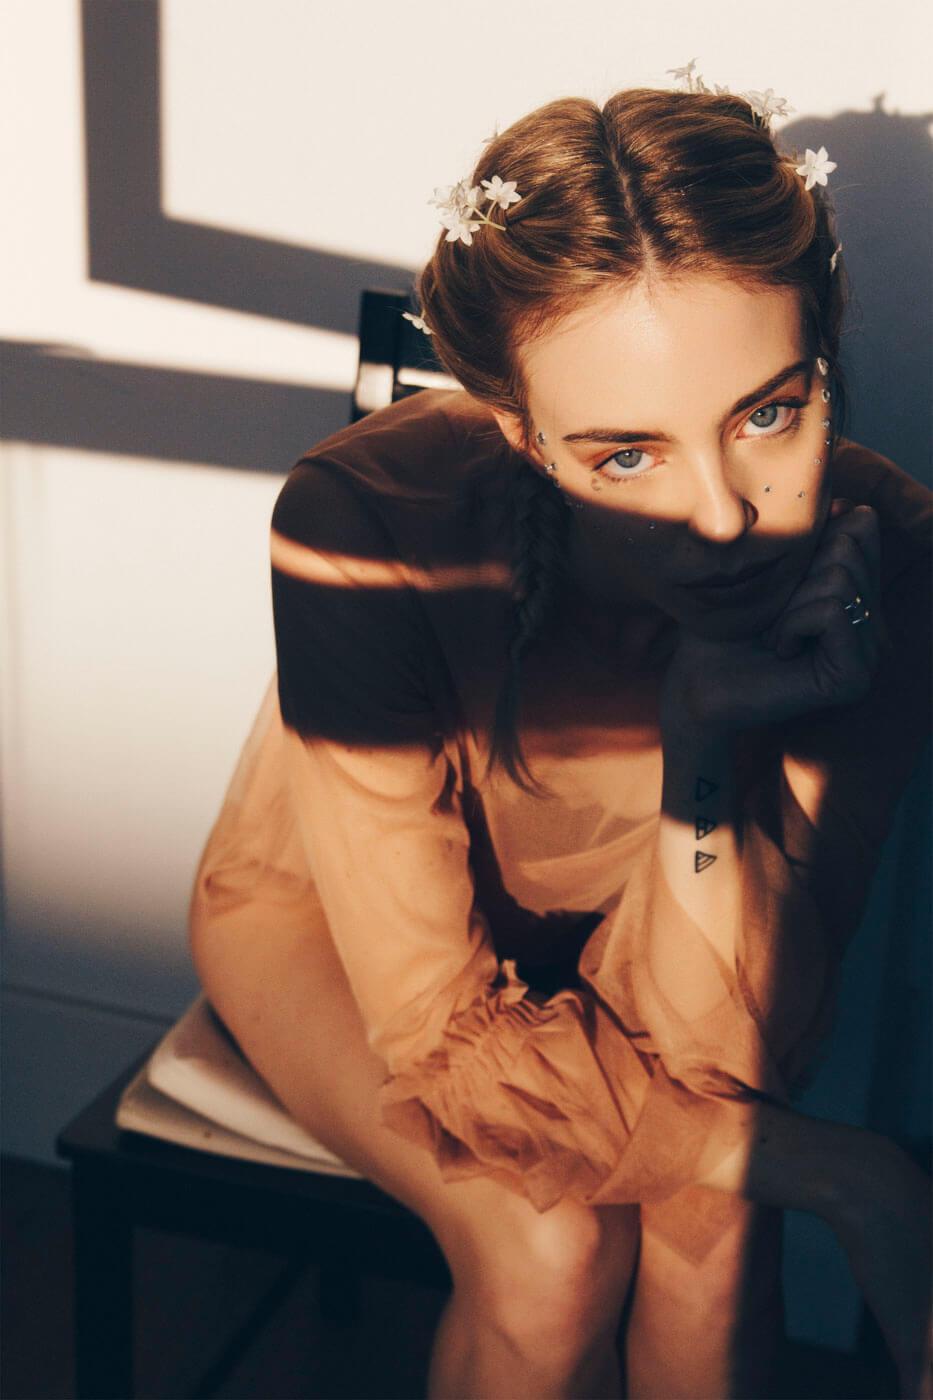 editorial-nextdoormodel-maquillaje-peinado-moda-barcelona_12